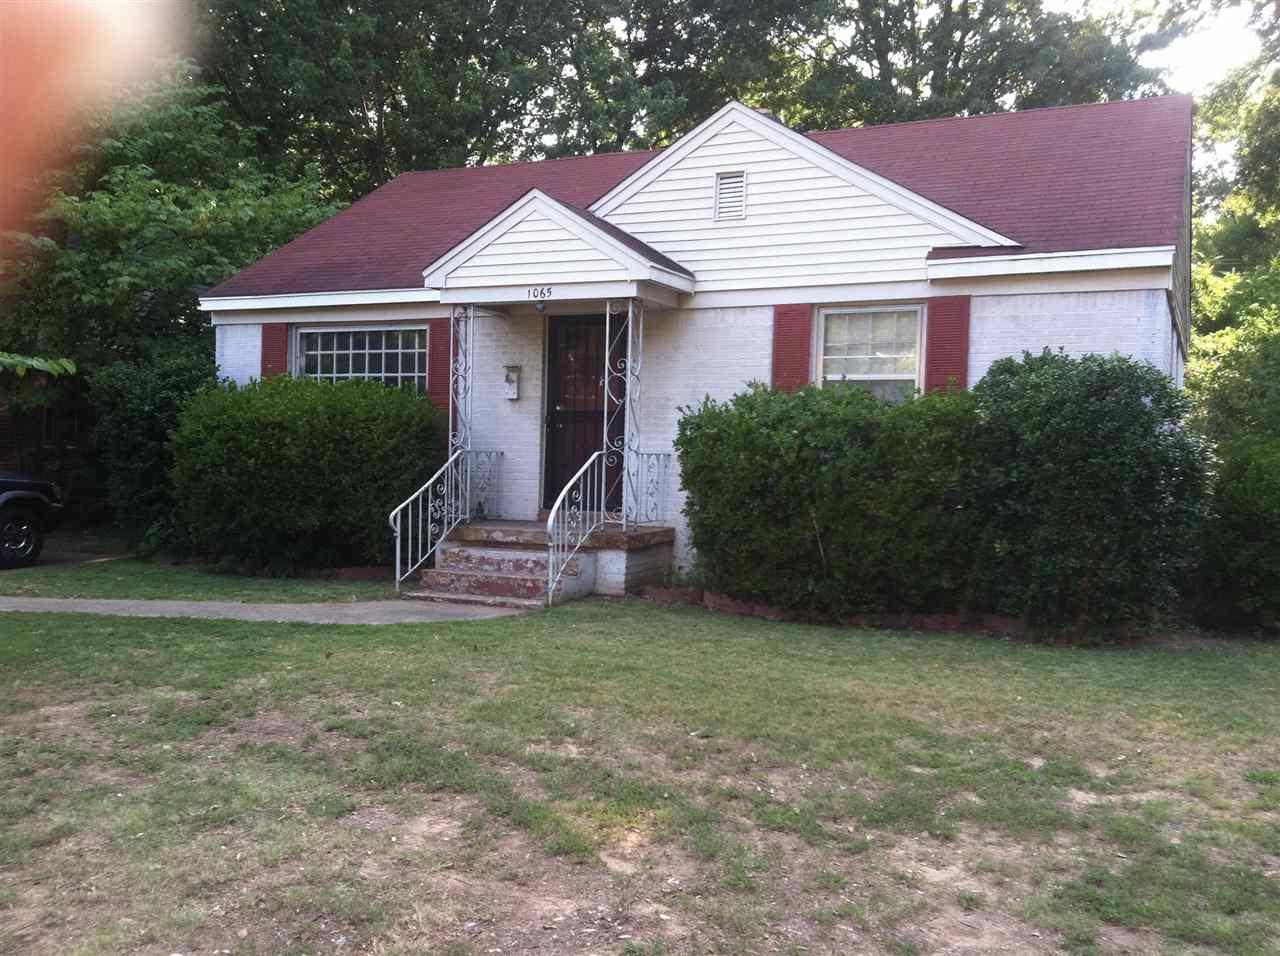 1065 Robin Hood Ln, Memphis, TN